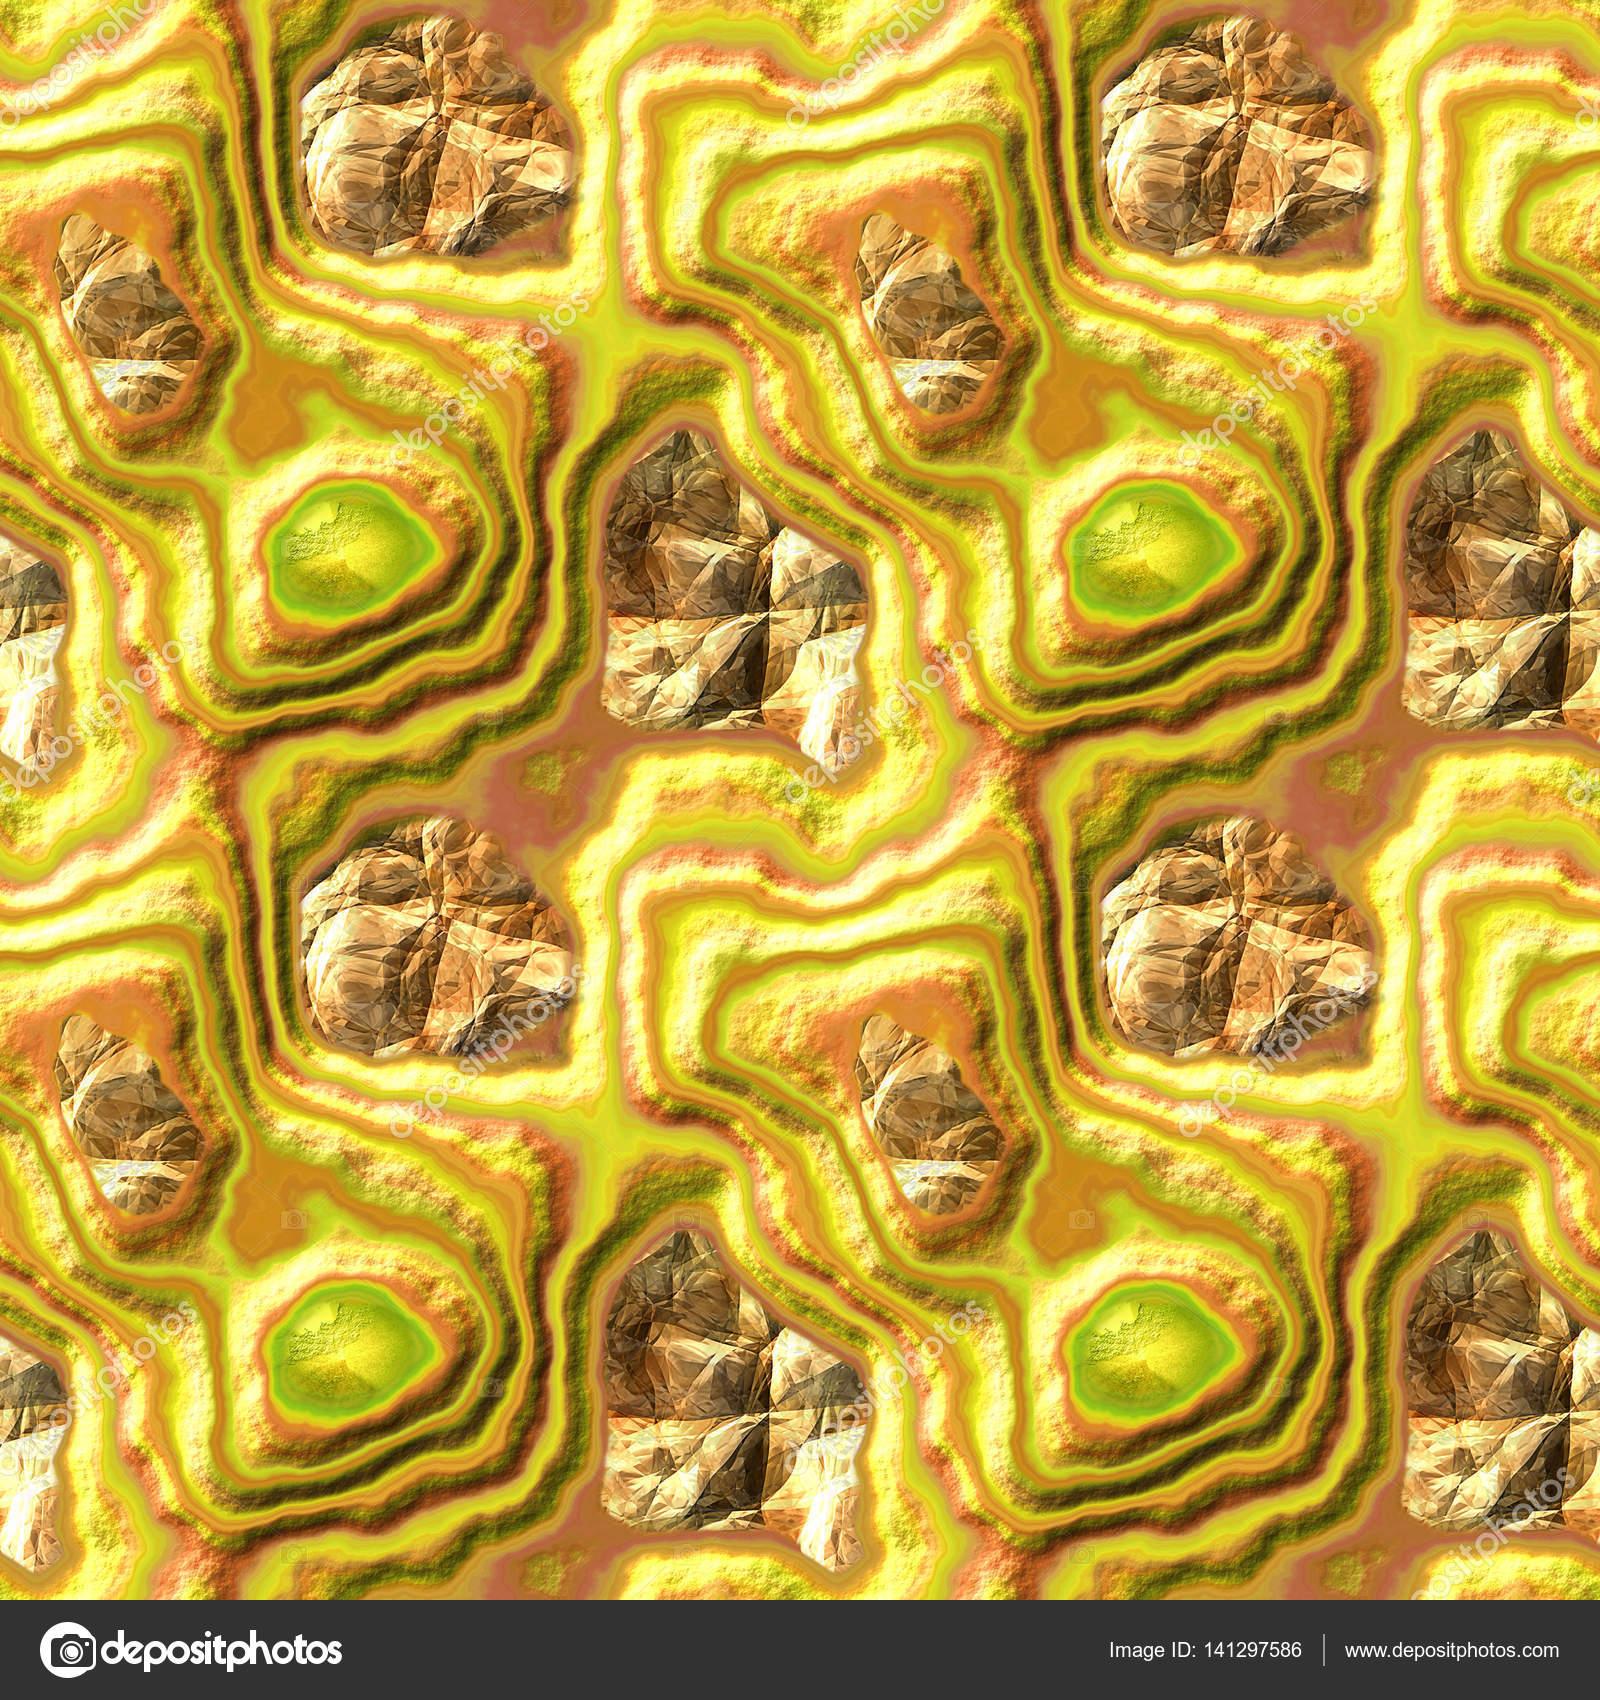 https://st3.depositphotos.com/4256445/14129/i/1600/depositphotos_141297586-stockafbeelding-abstract-naadloze-3d-verlichting-patroon.jpg